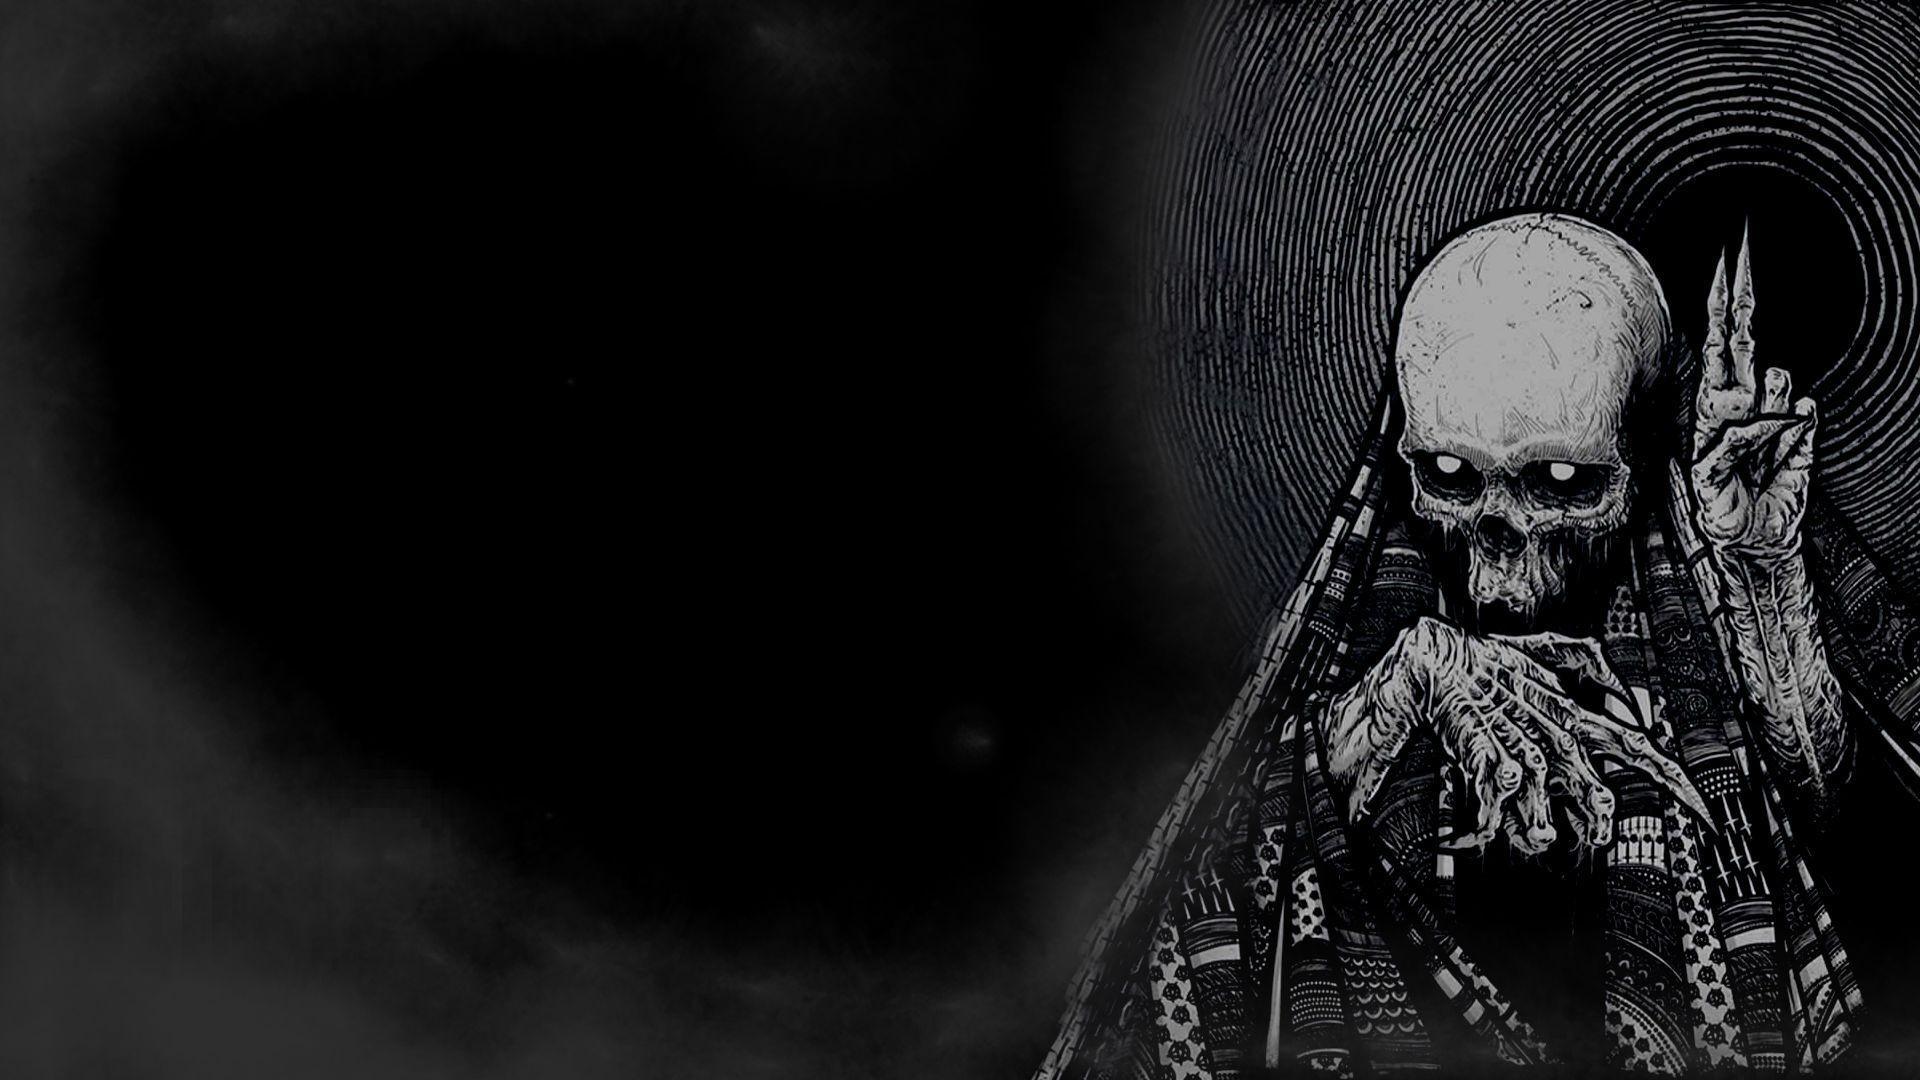 Full HD p Skull Wallpapers HD Desktop Backgrounds x